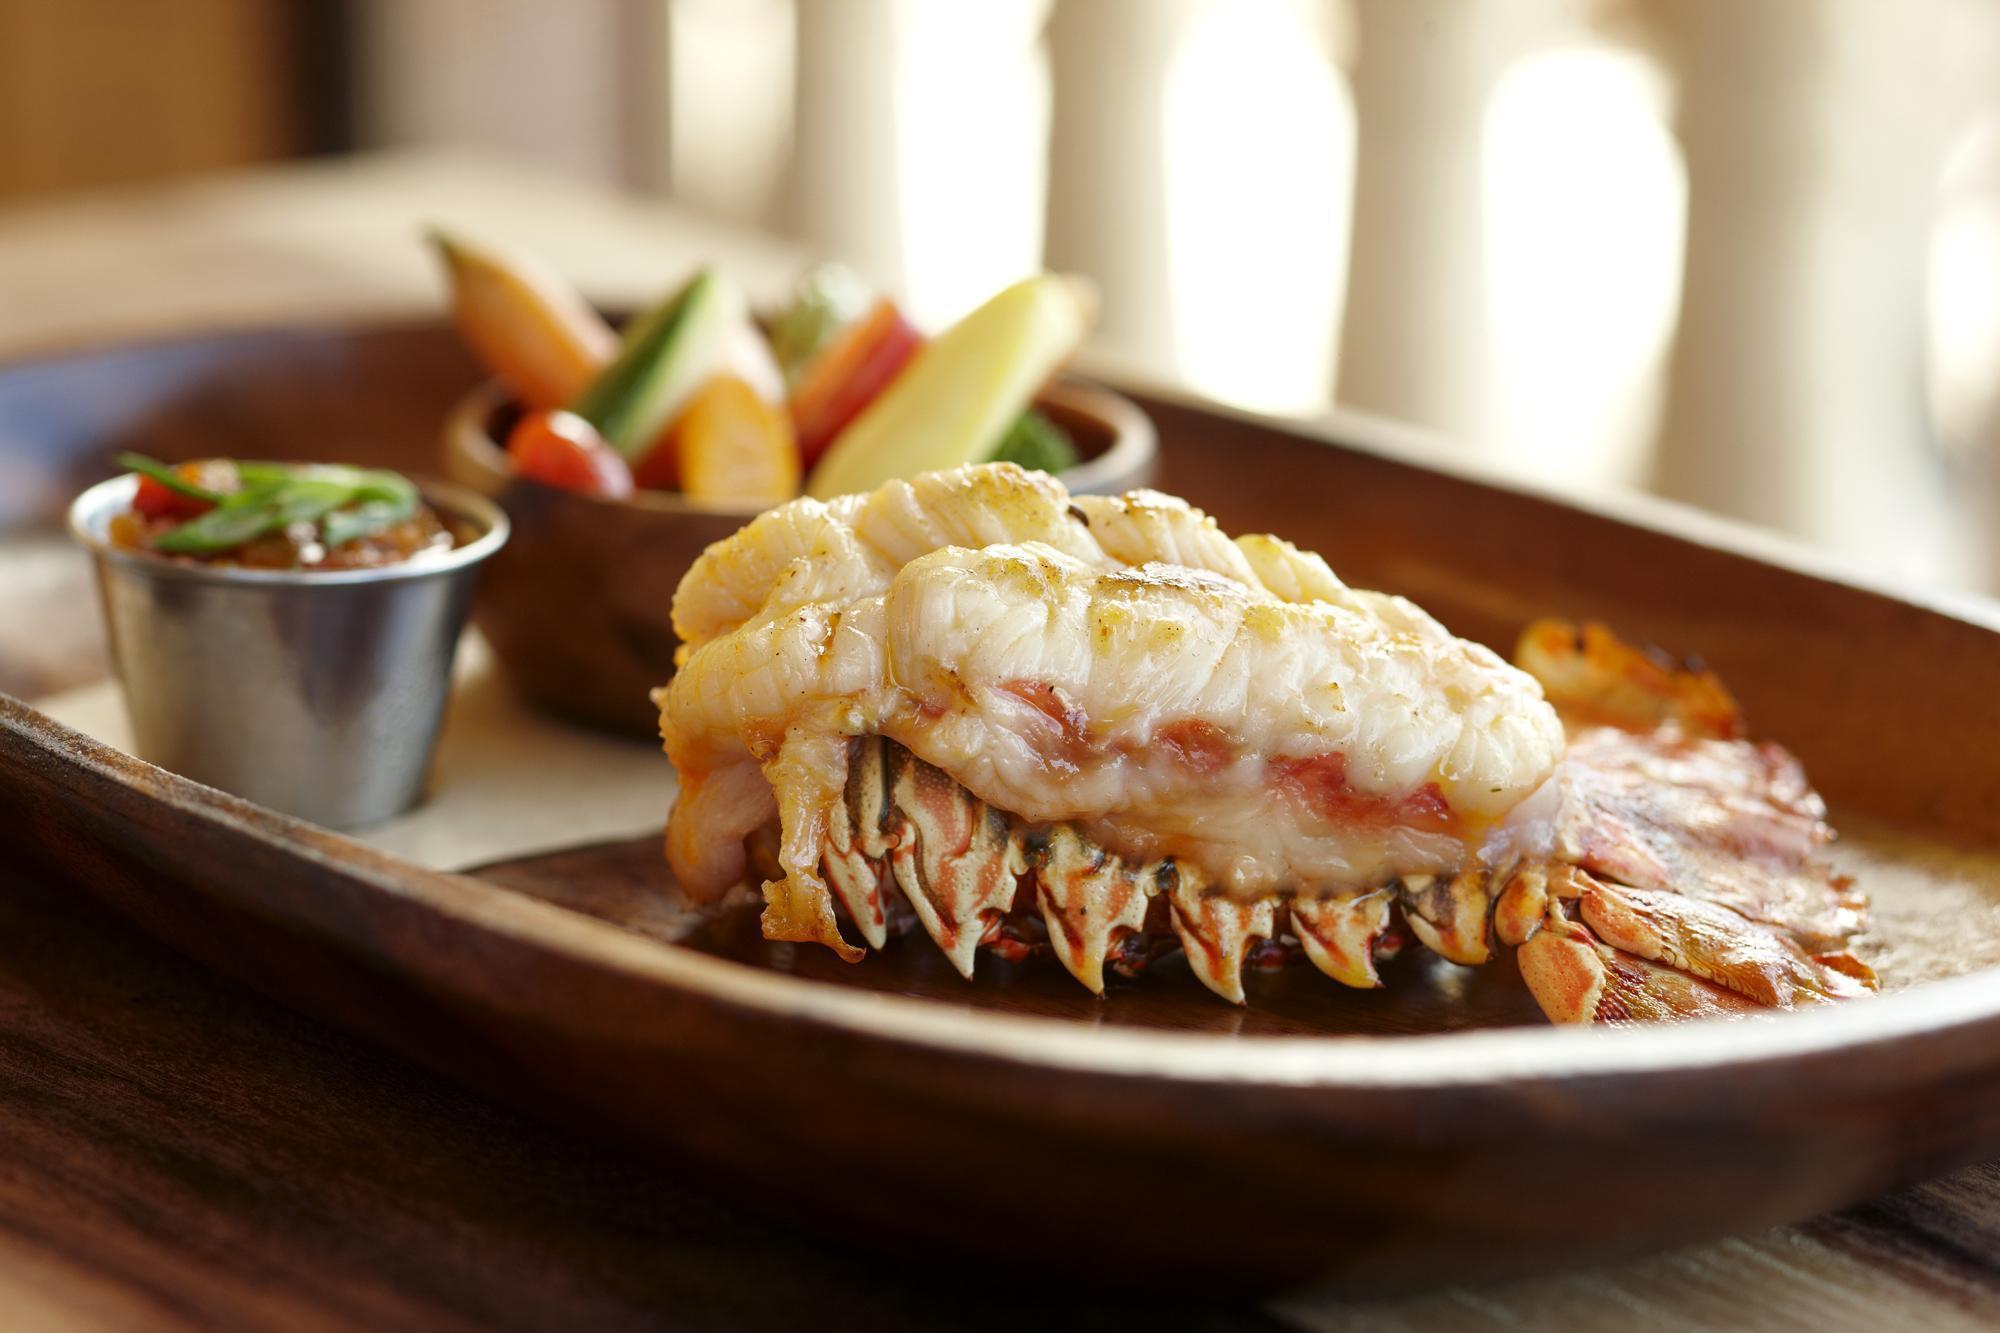 Mmmmm lobster!